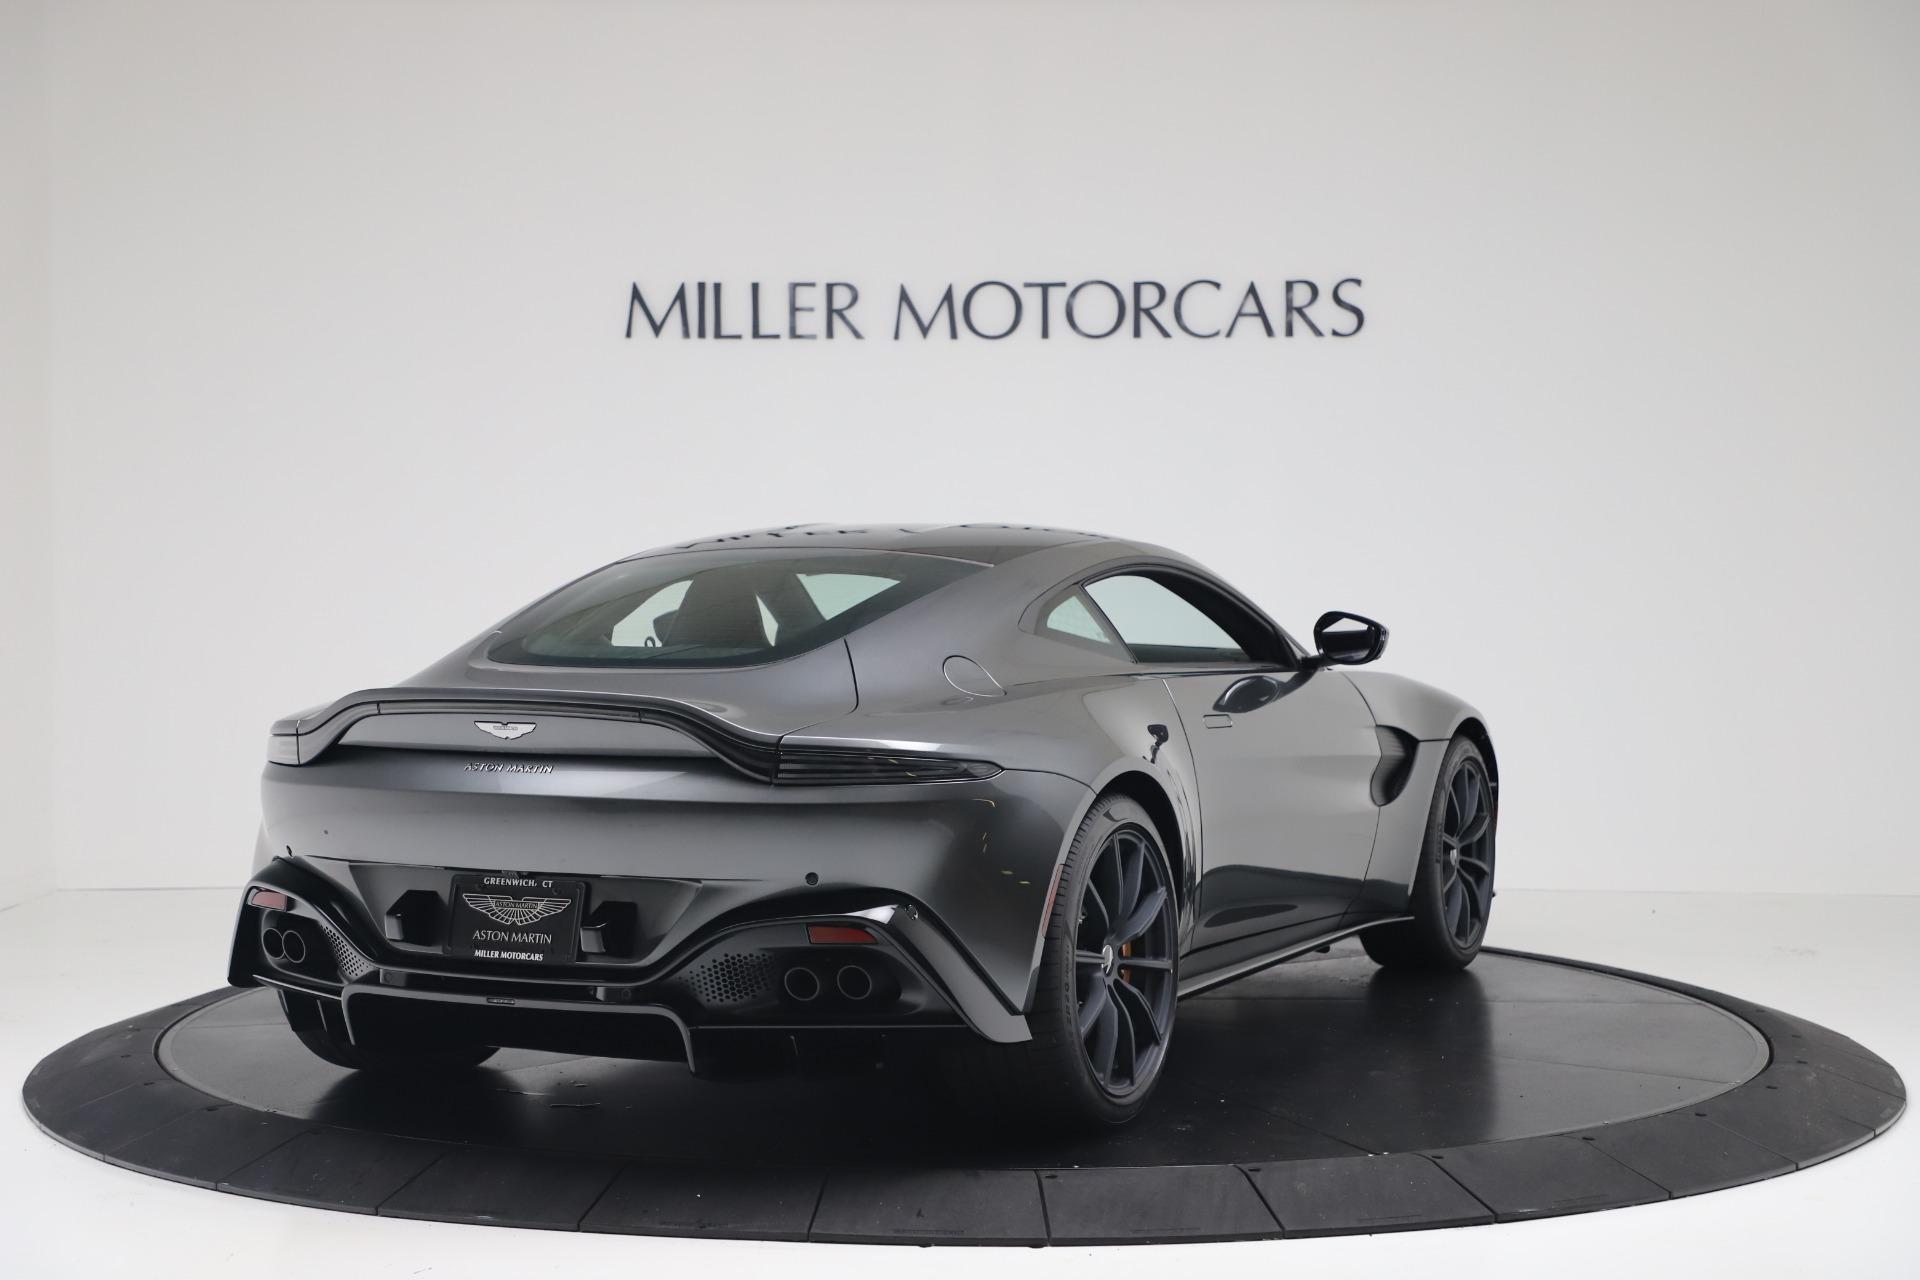 New 2020 Aston Martin Vantage V8 For Sale In Greenwich, CT 3408_p8